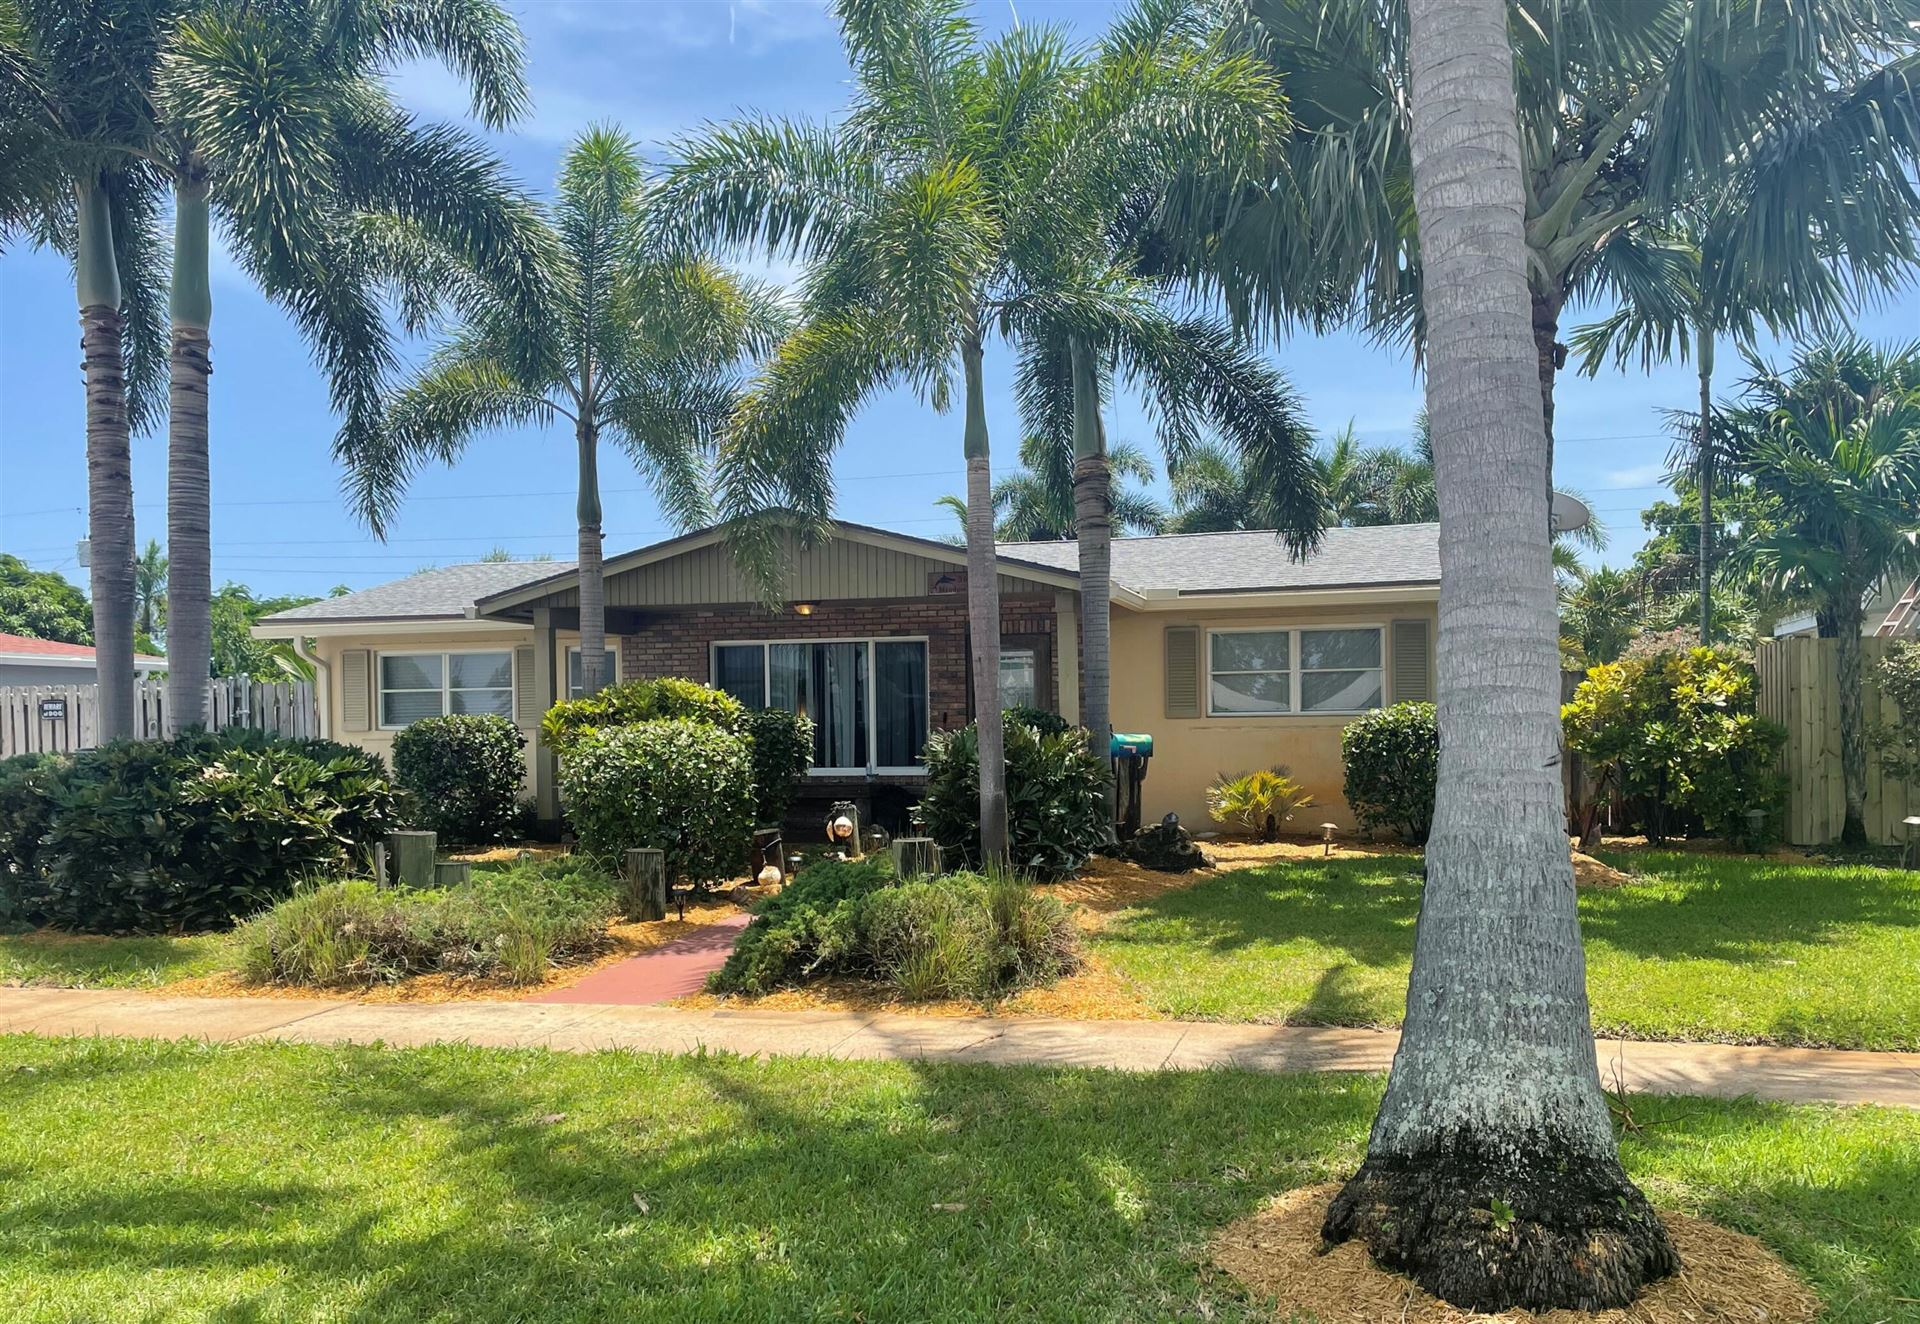 2608 Meadow Road, West Palm Beach, FL 33406 - MLS#: RX-10731980